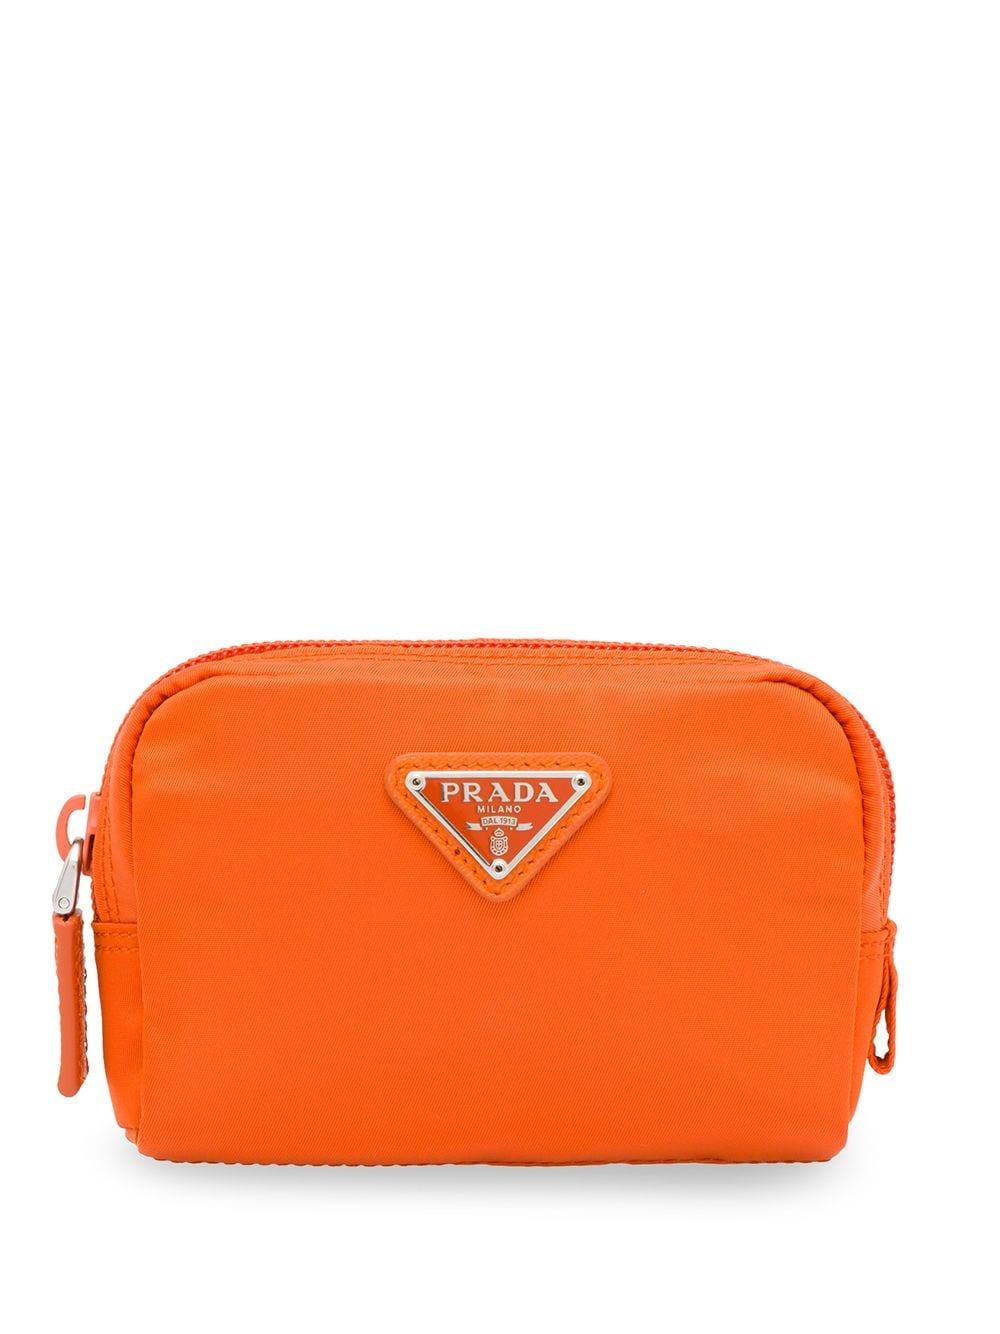 Prada Logo Plaque Cosmetics Bag in 2020 Cosmetic bag